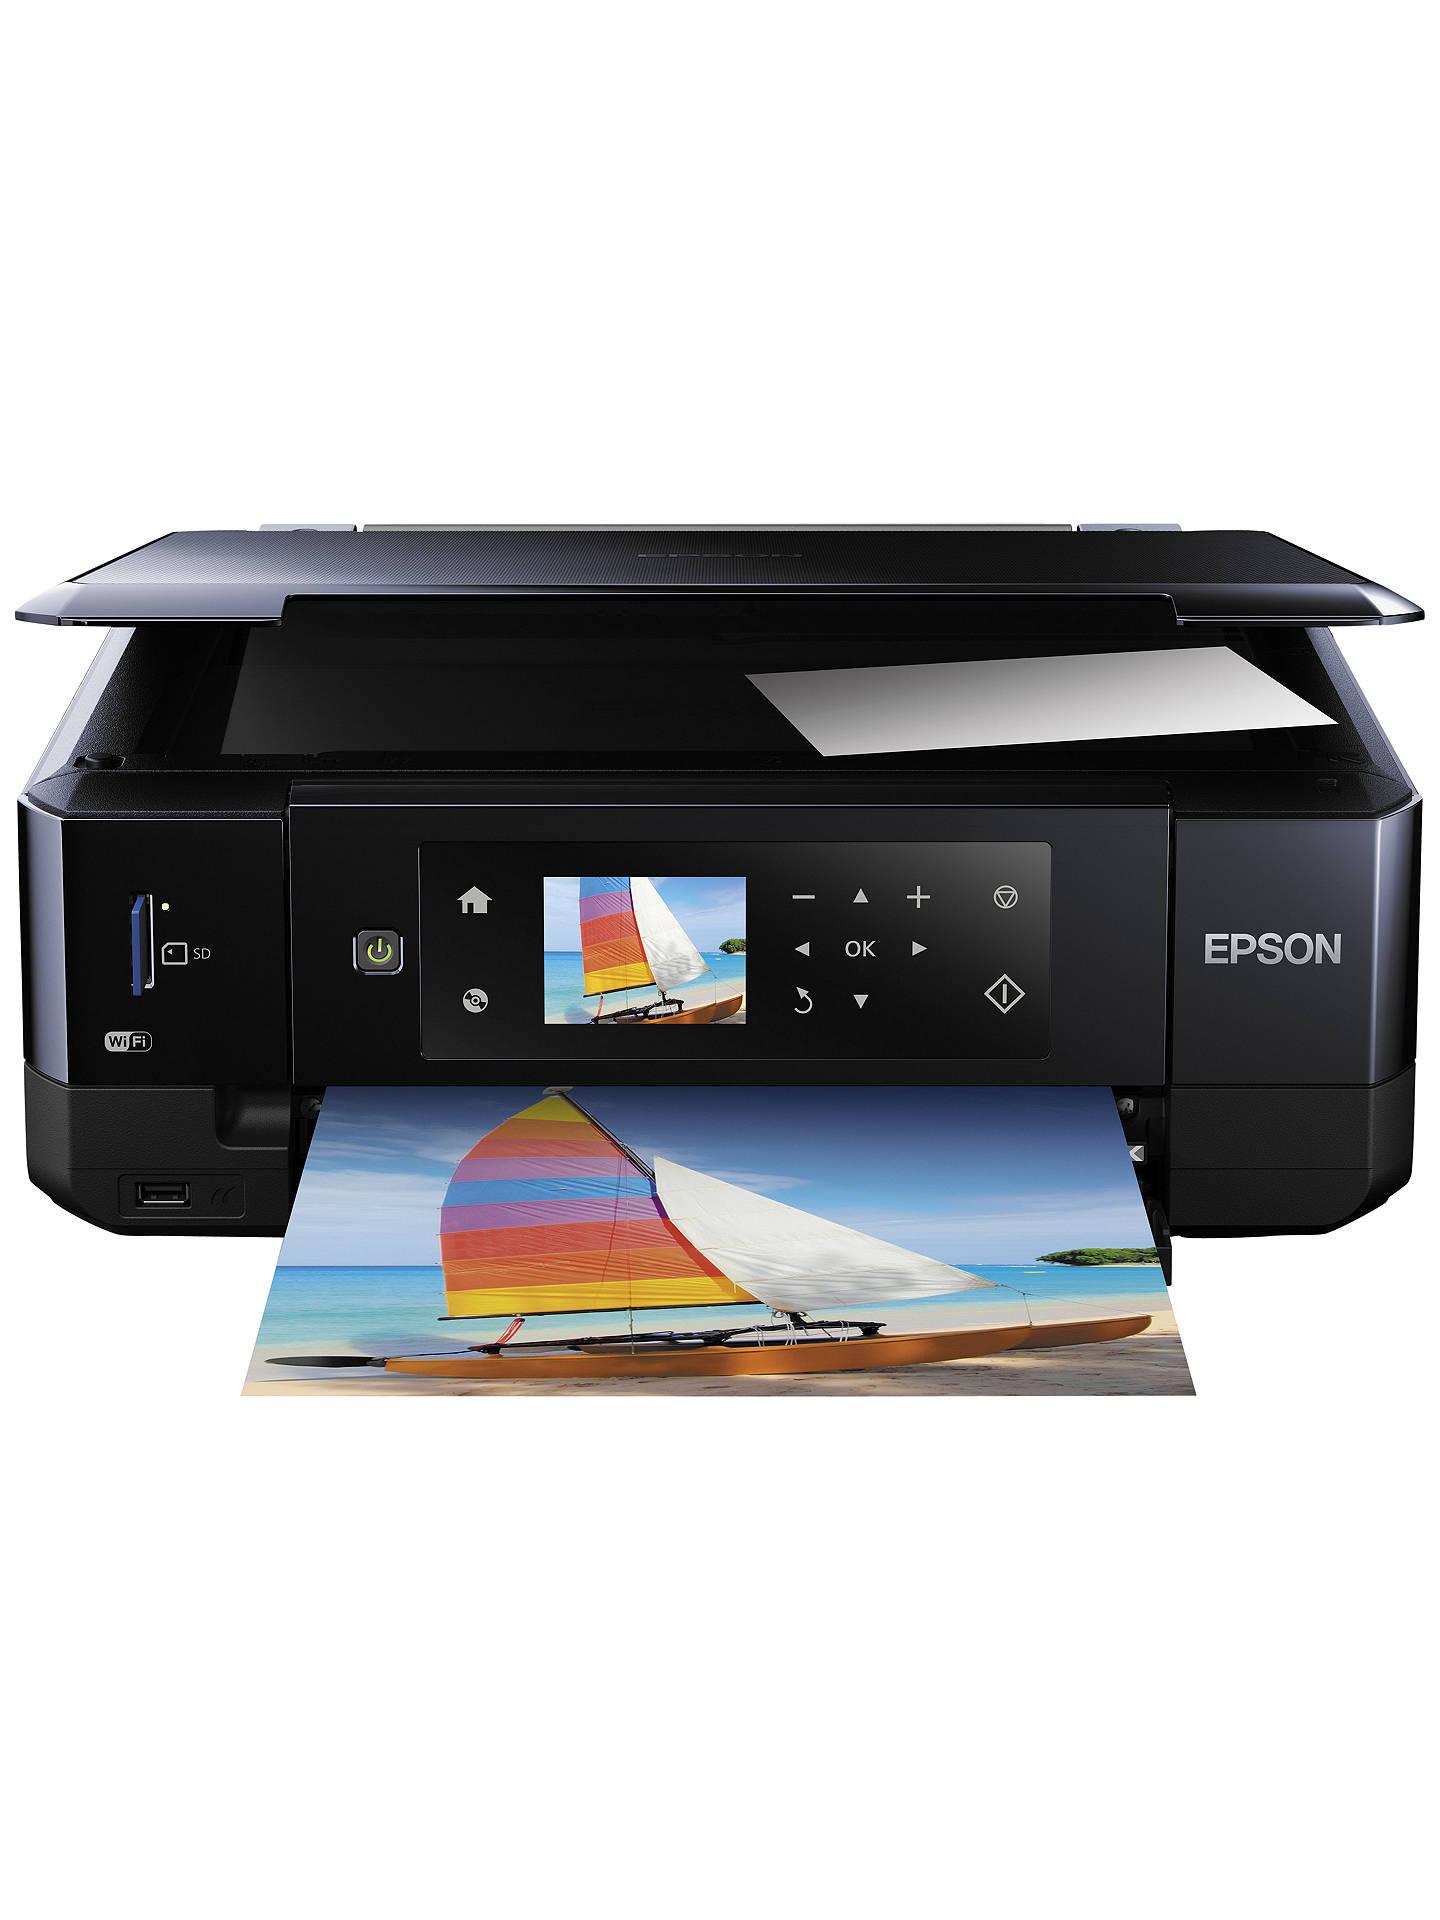 epson expression premium xp 630 all in one wireless printer black rh johnlewis com epson 640 manual epson workforce 630 manual pdf